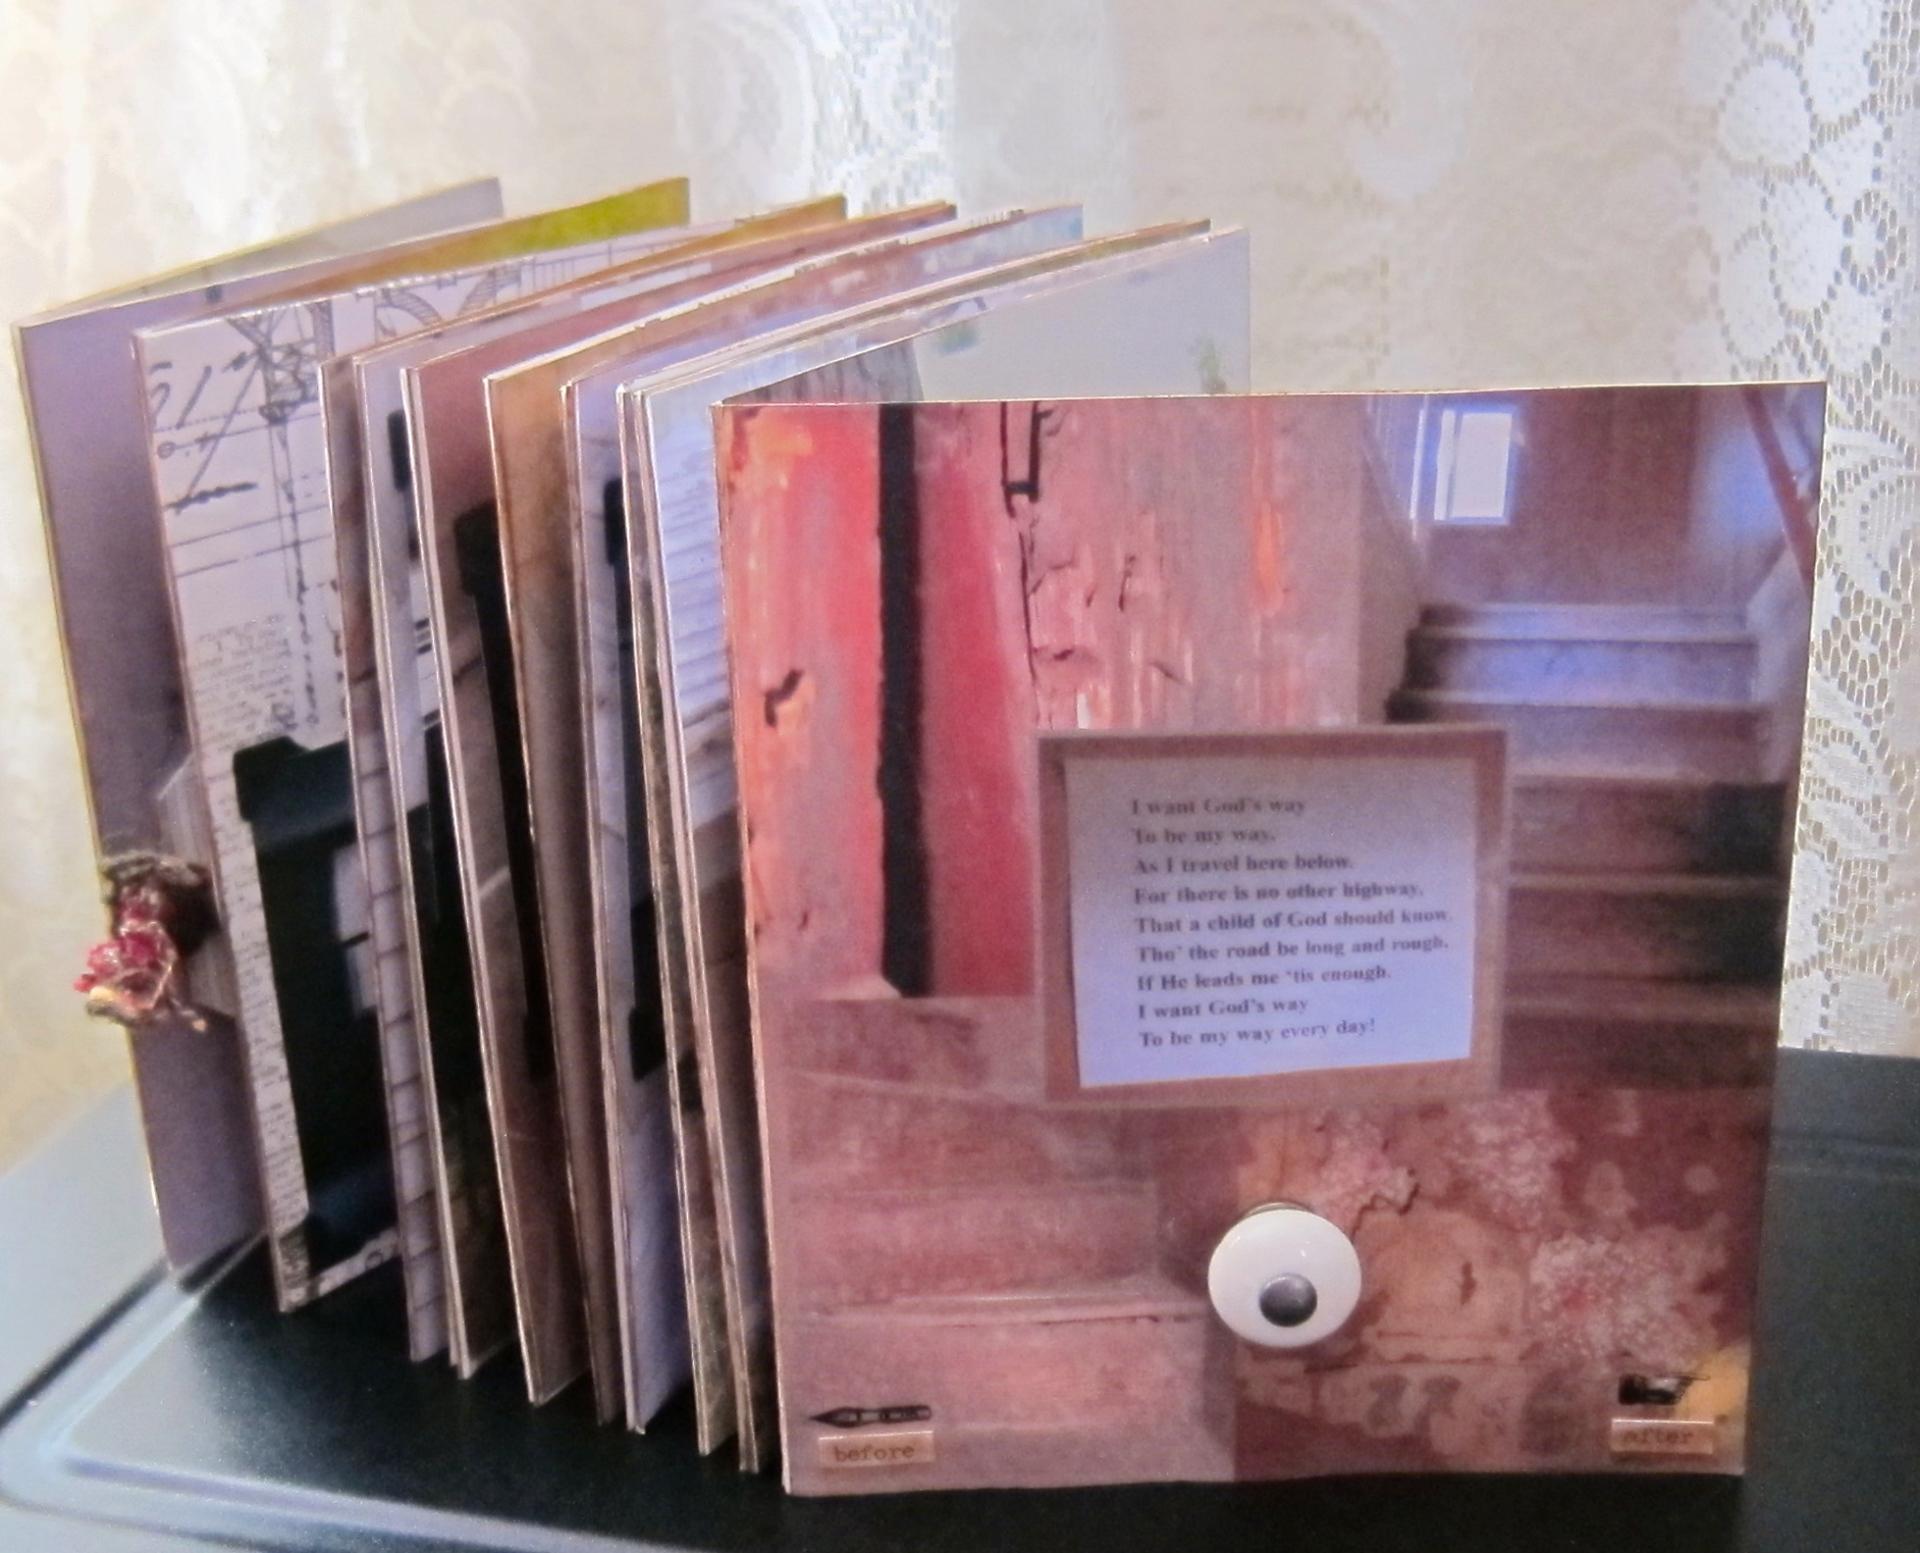 A Concertina Book (accordion fold)